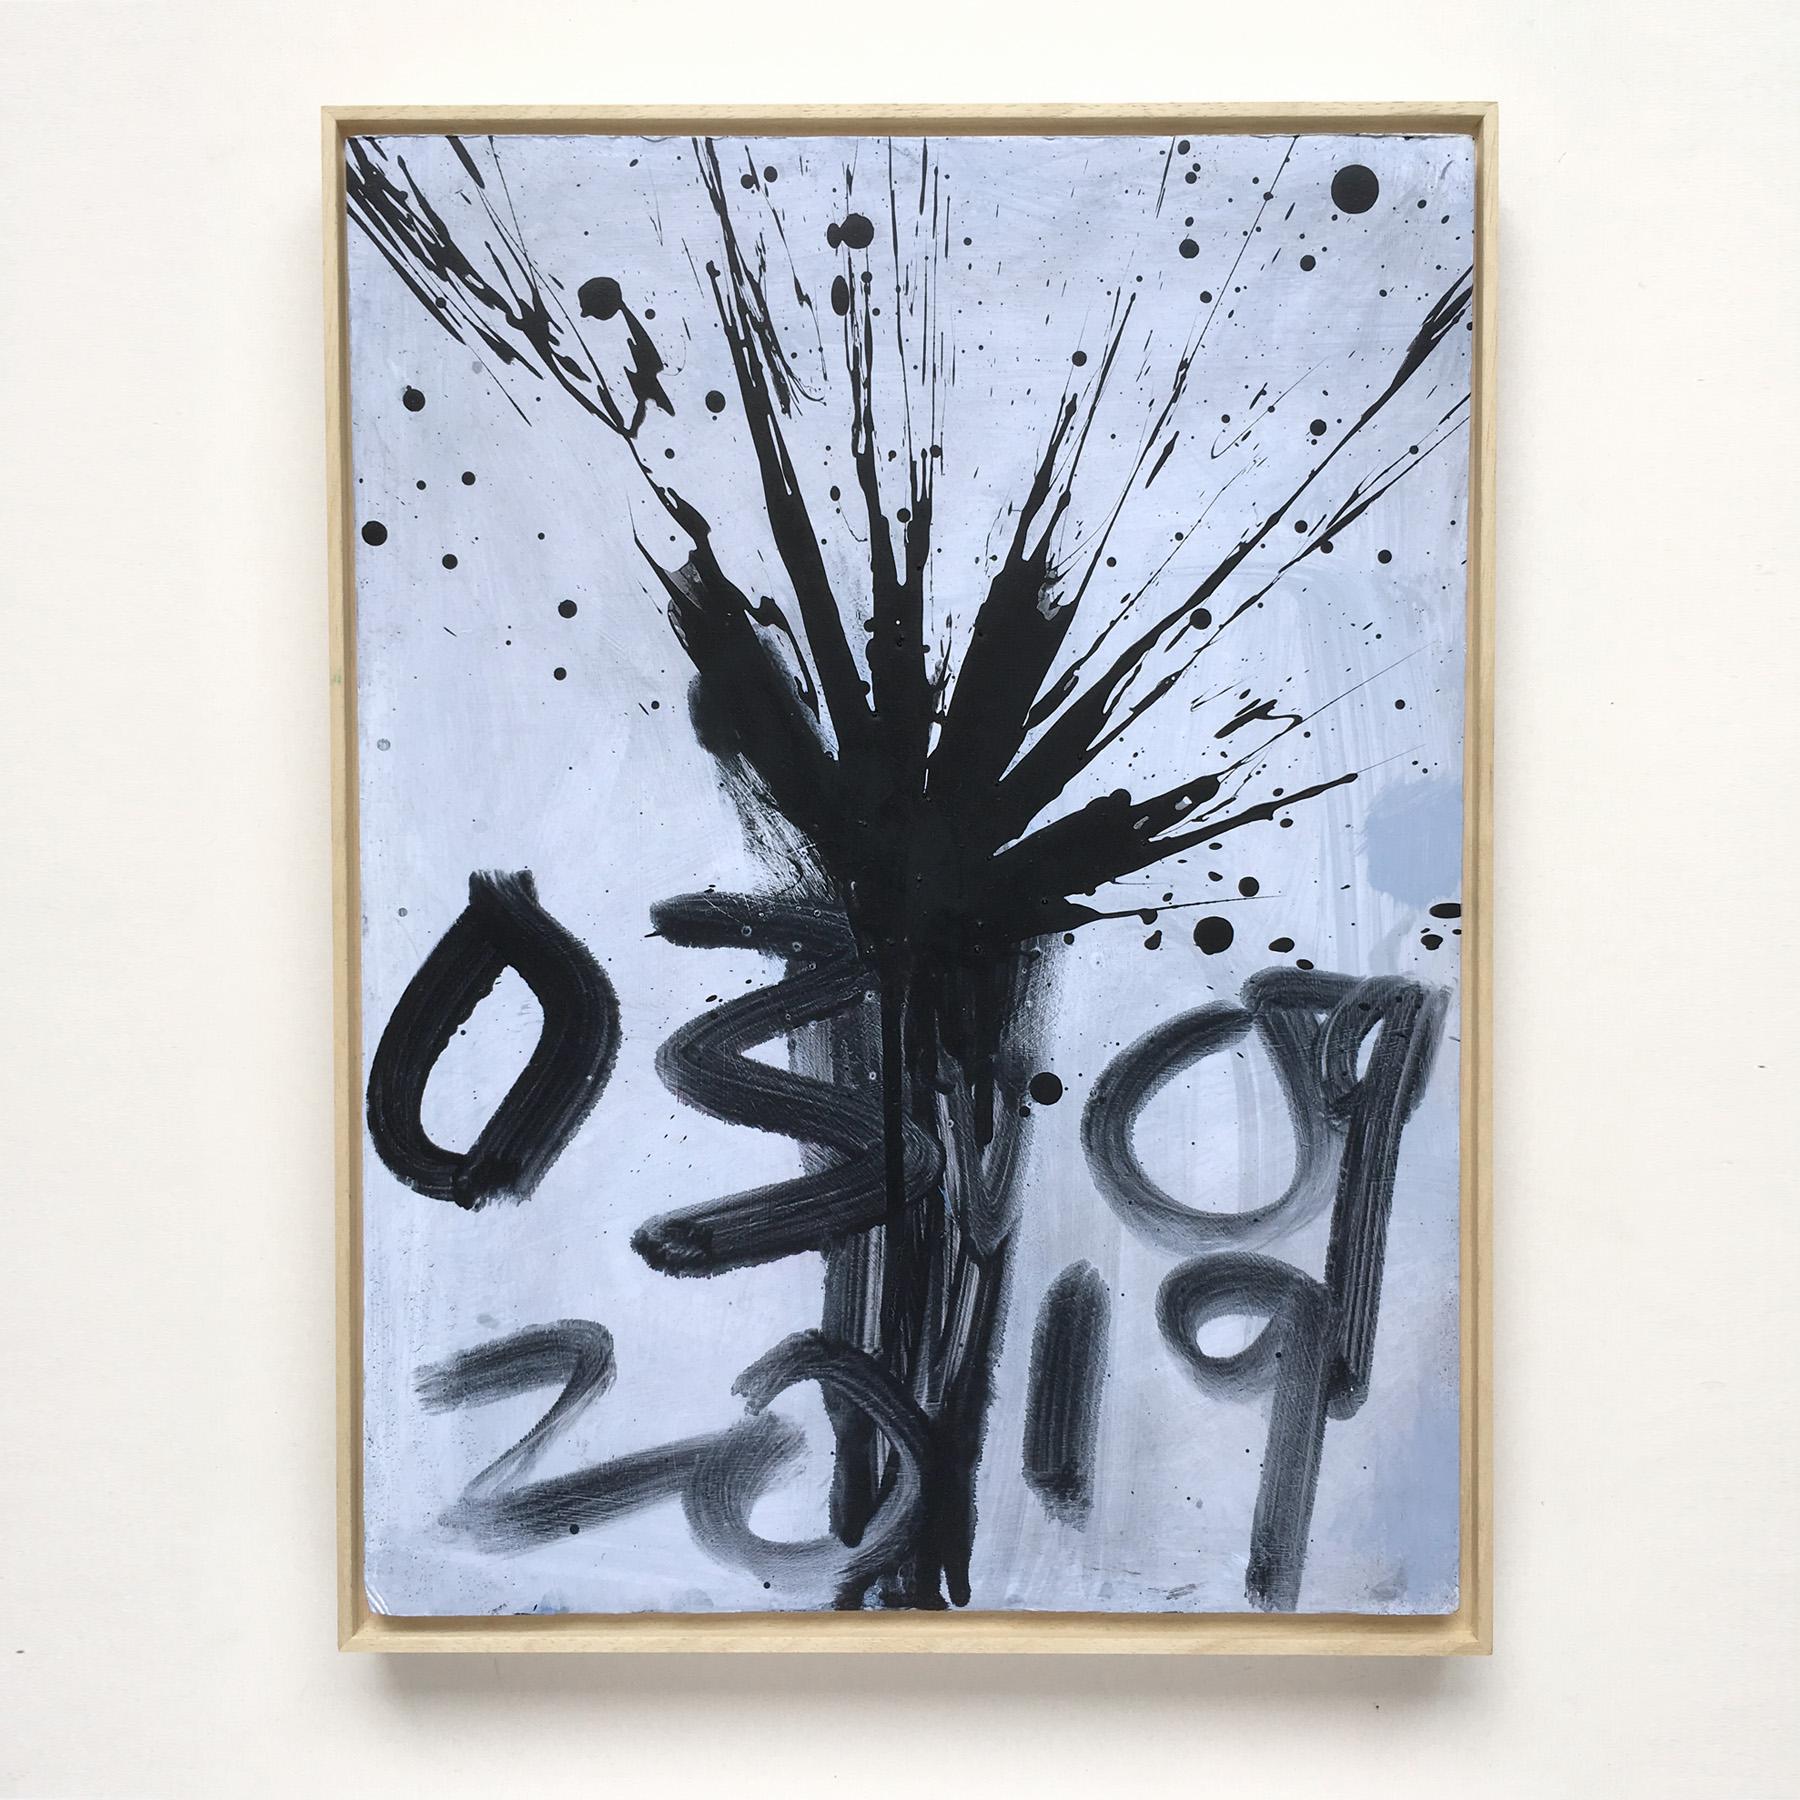 Black Firework Painting 03.09.19